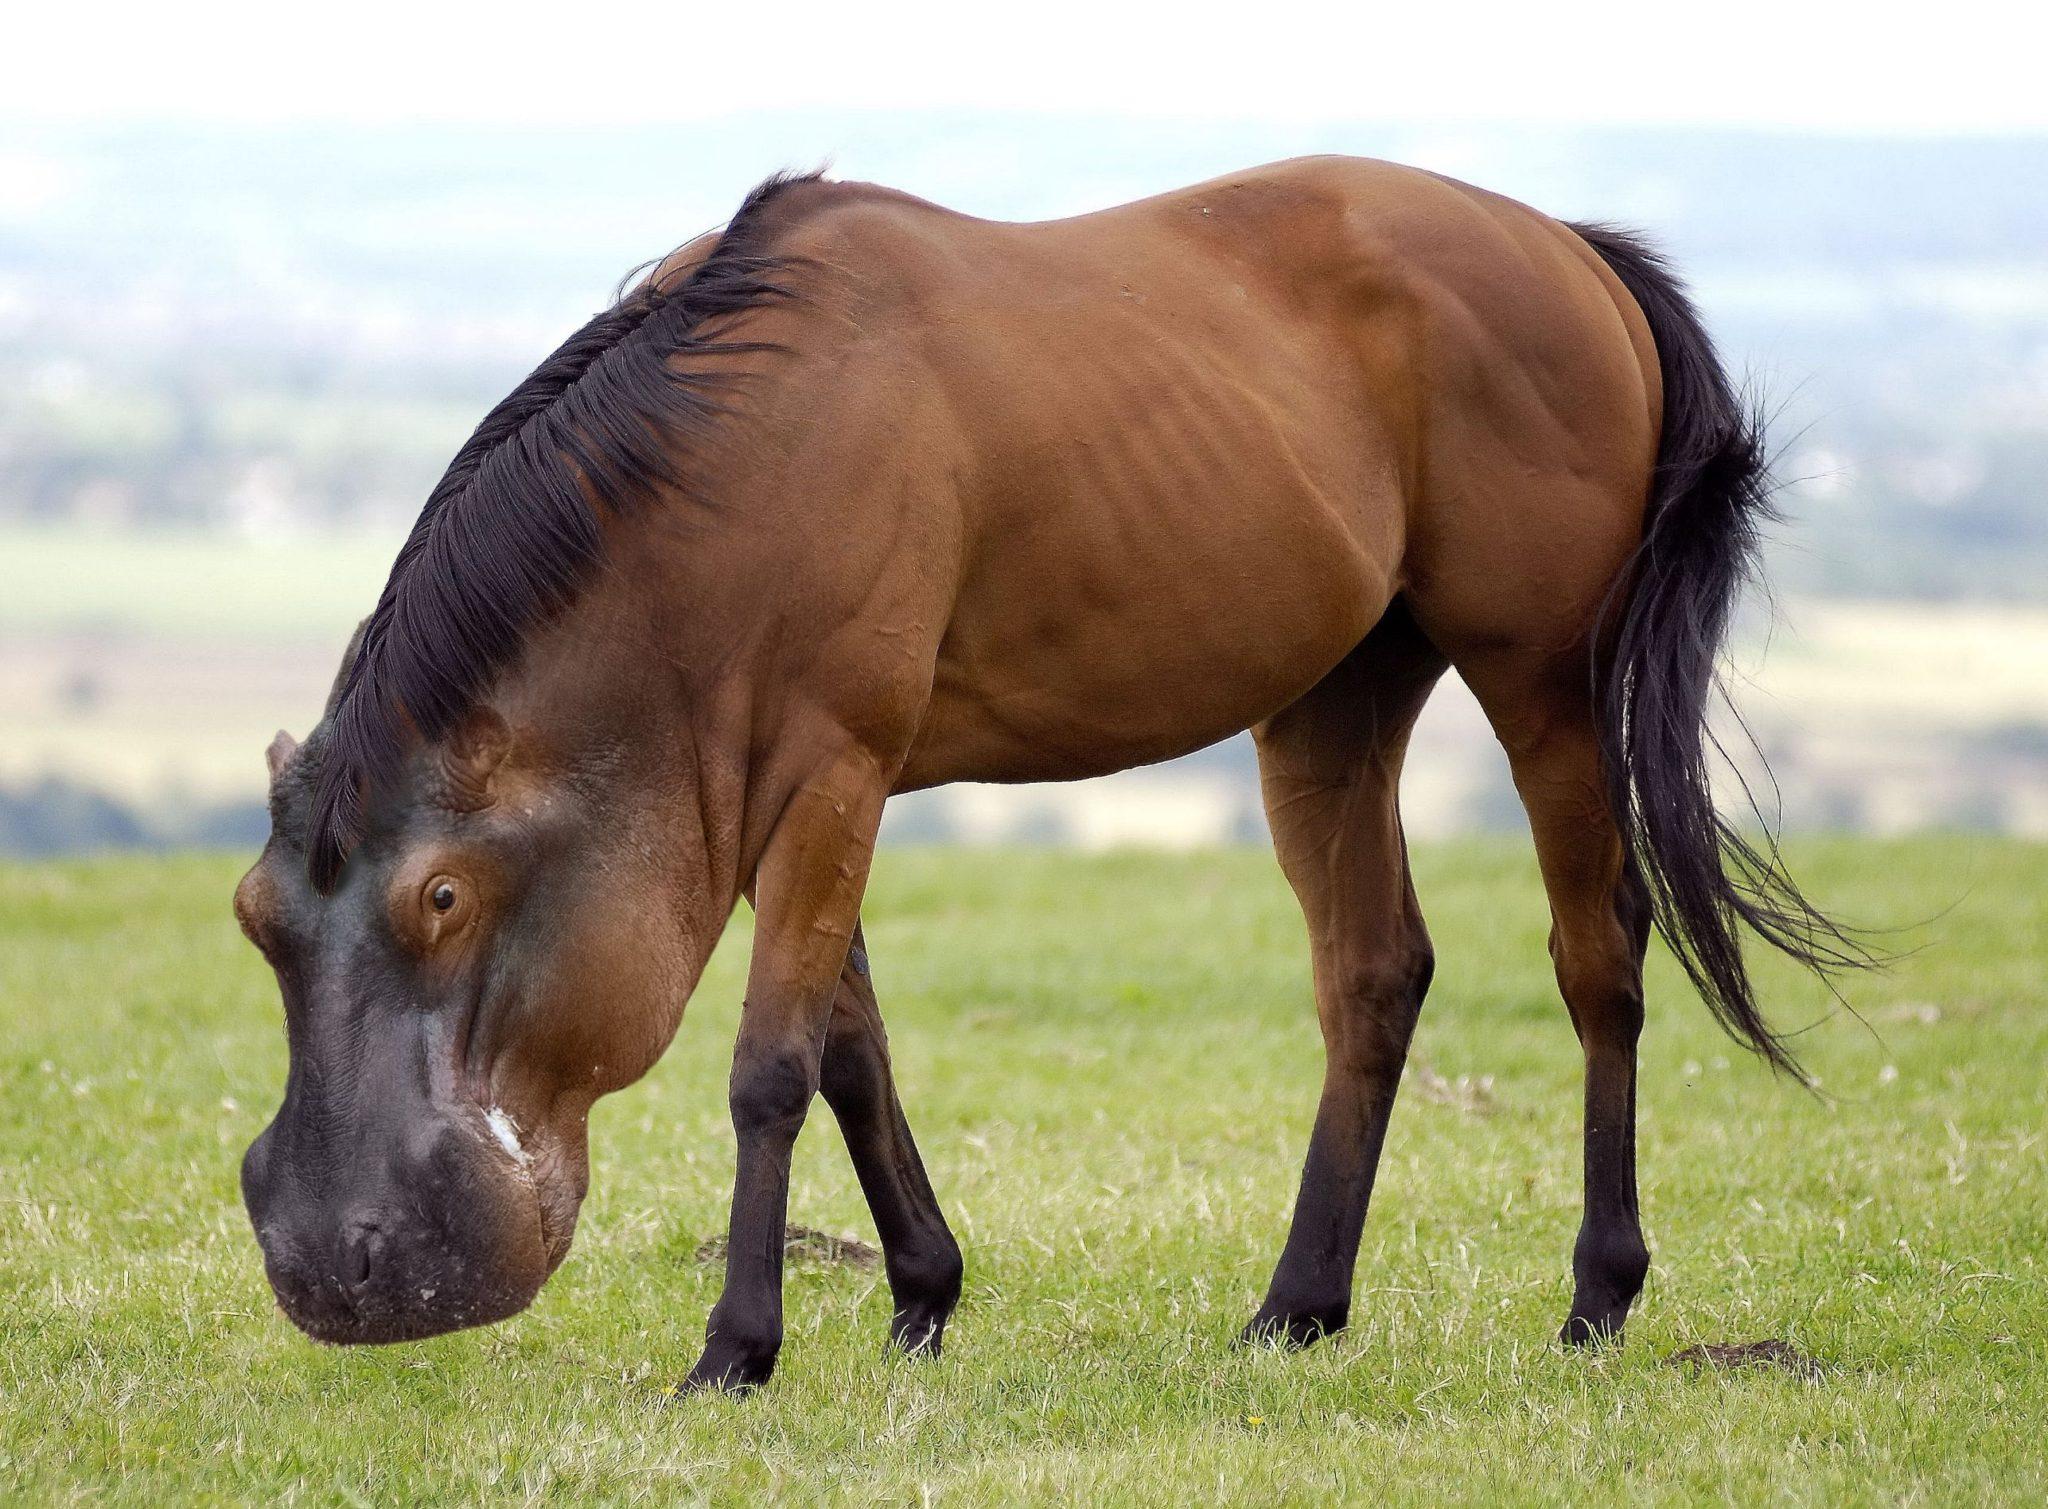 Animal Hybrid, Crossbred, Animal Combinations, Hybridization, Hybrid Species, Combined Animals, Animal Photos